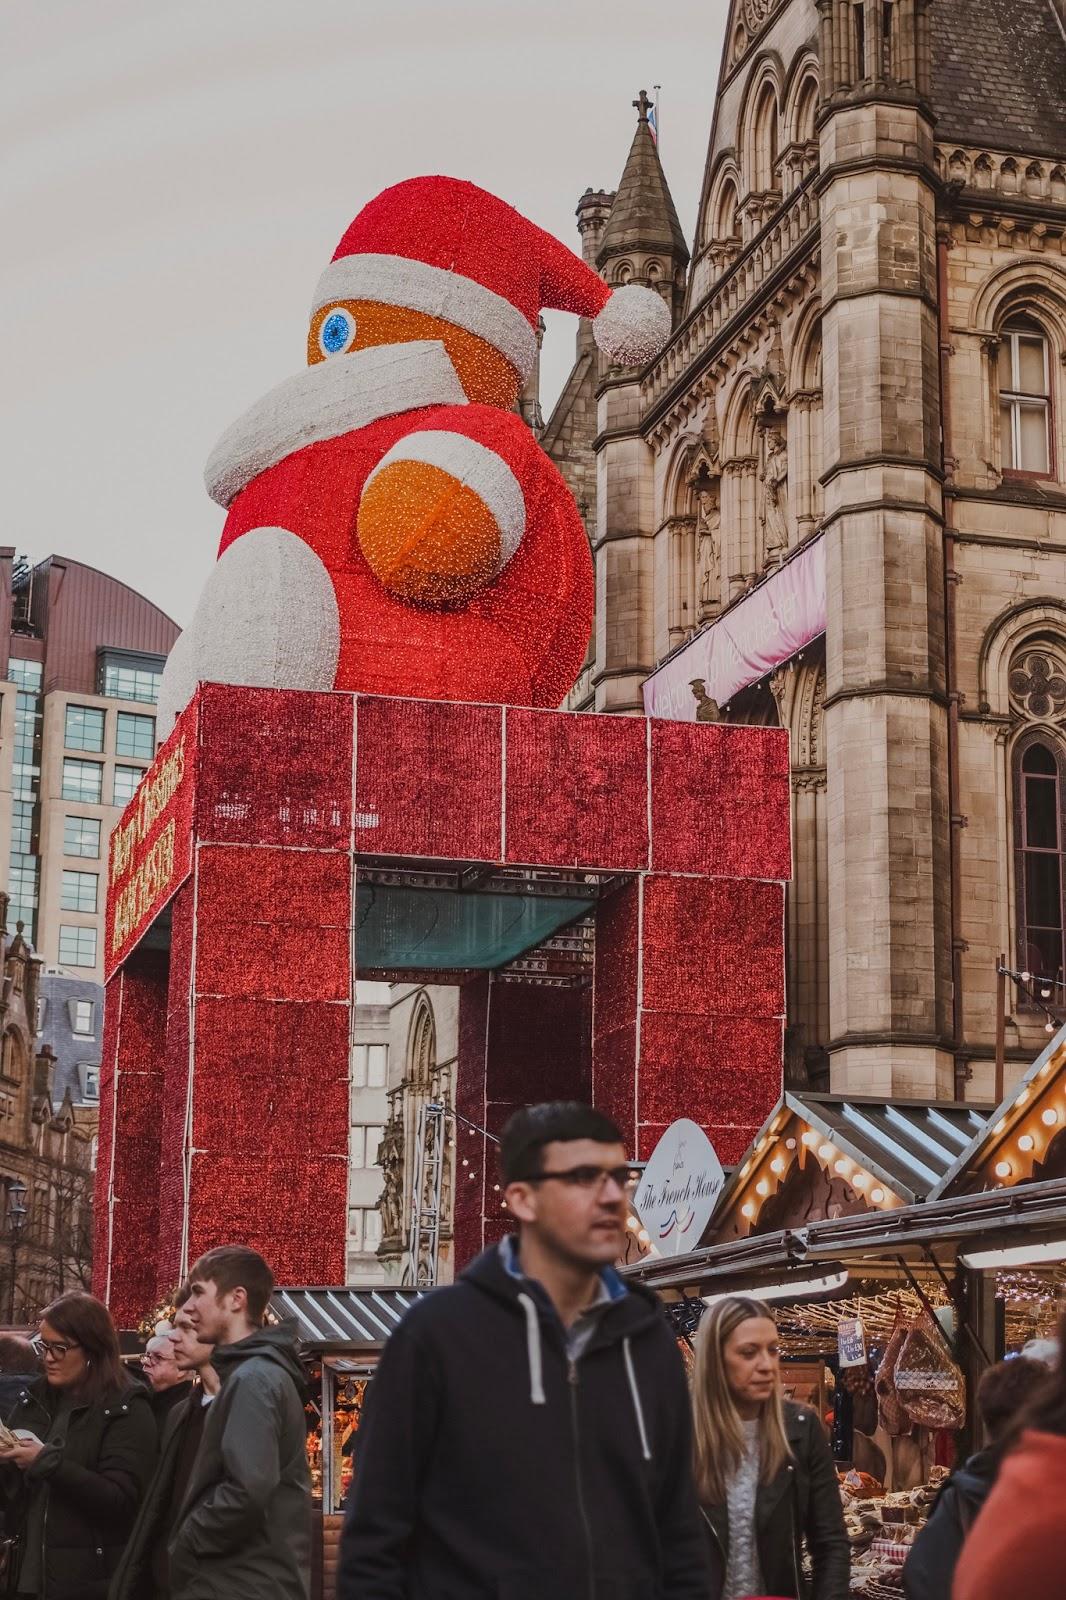 Zippy, Manchester, Manchester Christmas Markets, Derbyshire, Derby Christmas Market, German Christmas Markets UK, Festive,